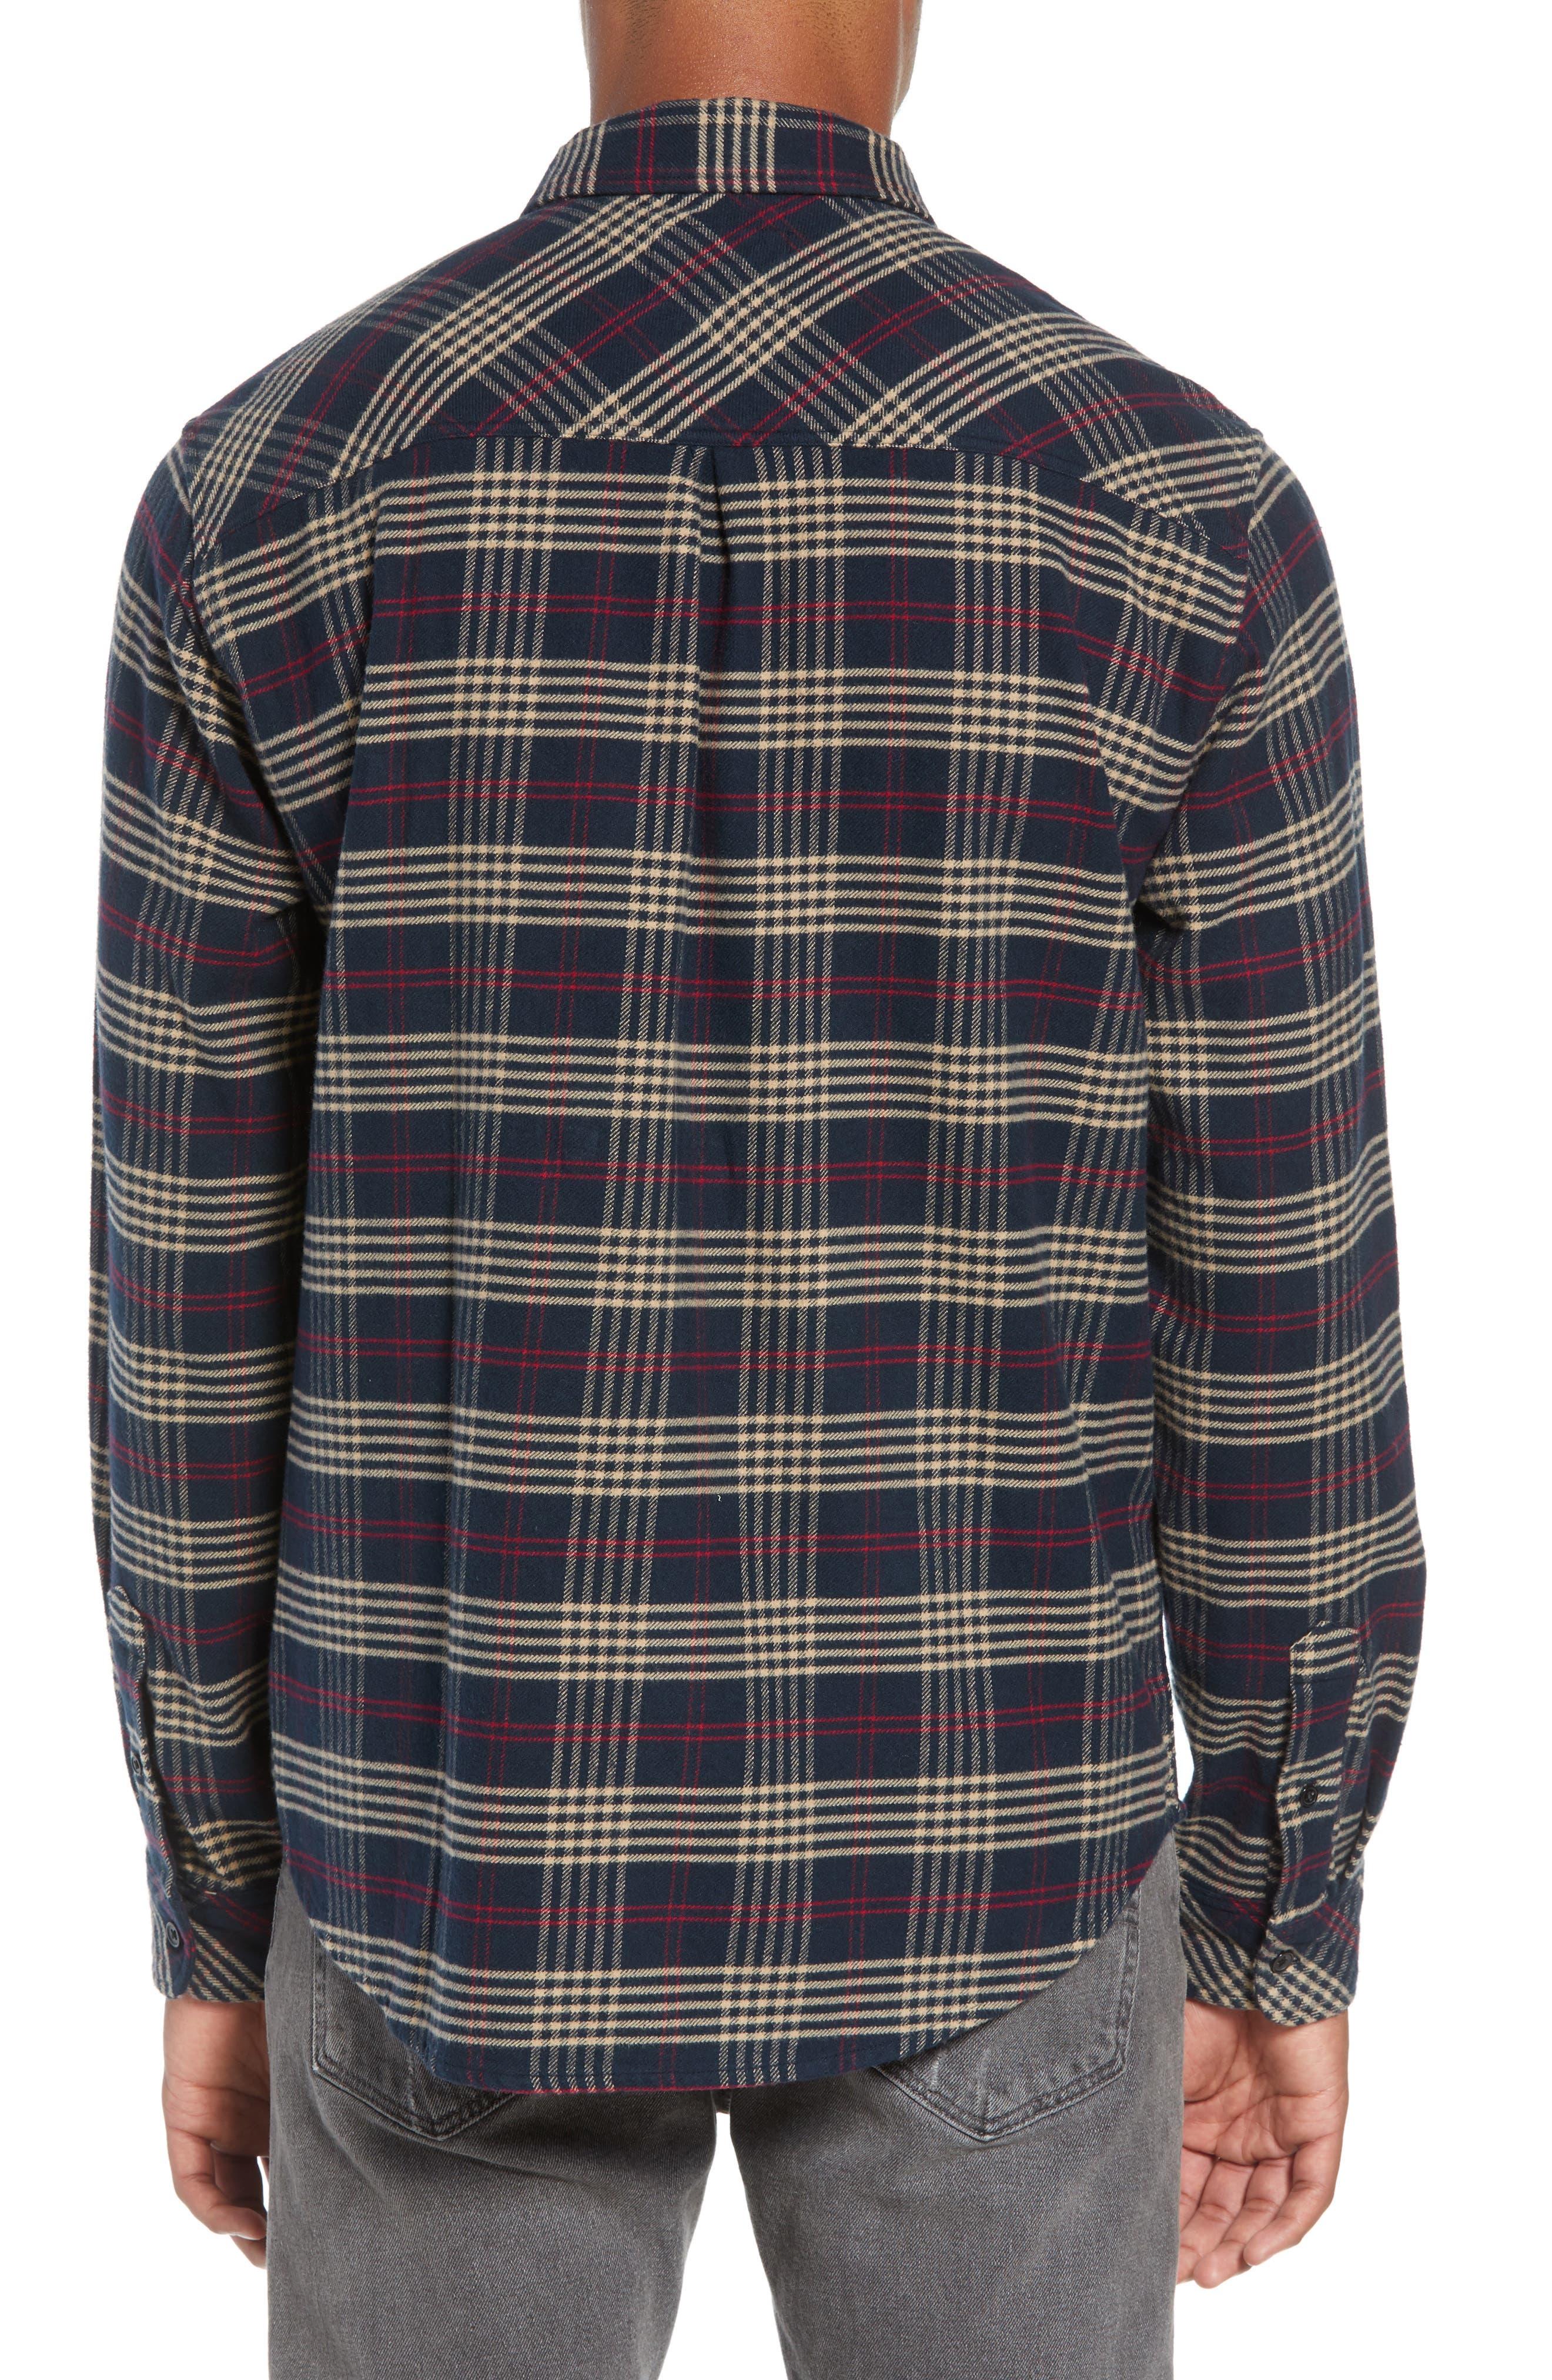 Forrest Slim Fit Plaid Flannel Sport Shirt,                             Alternate thumbnail 3, color,                             NAVY/RED/ELM